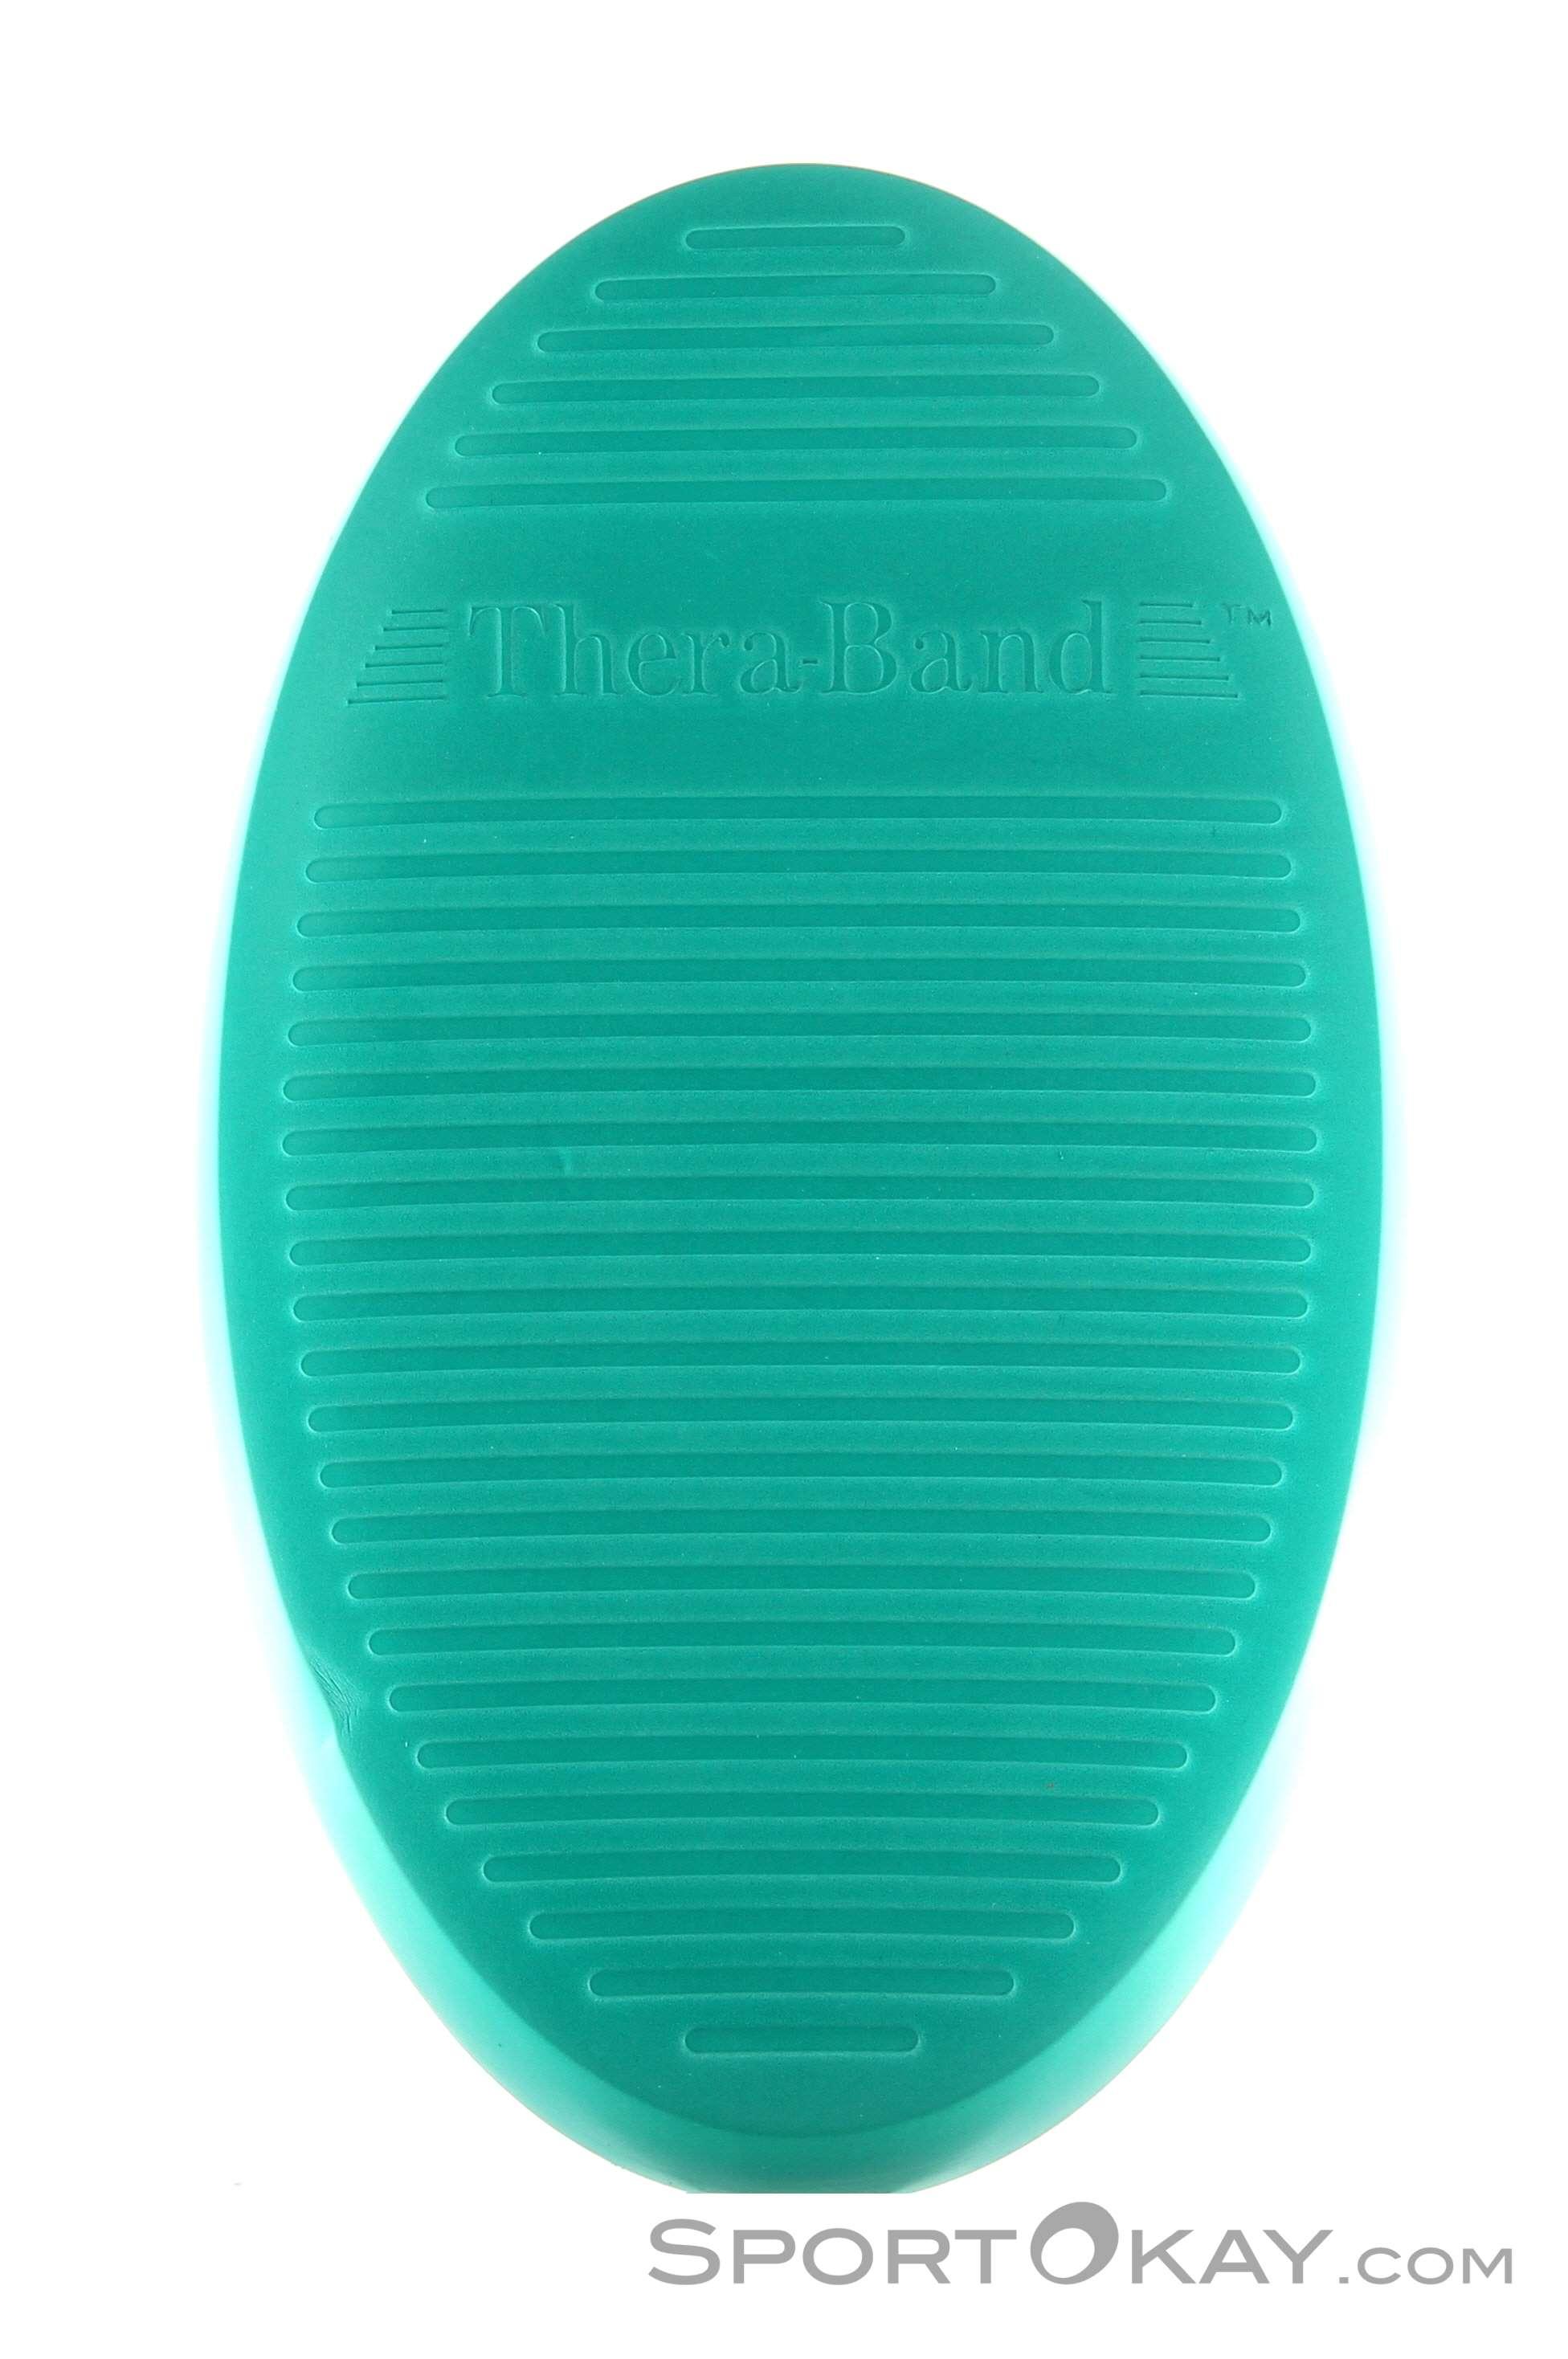 Thera Band 35x20cm Stabilitätstrainer, Thera Band, Grün, , Herren, 0275-10017, 5637551149, 087453233056, N1-01.jpg